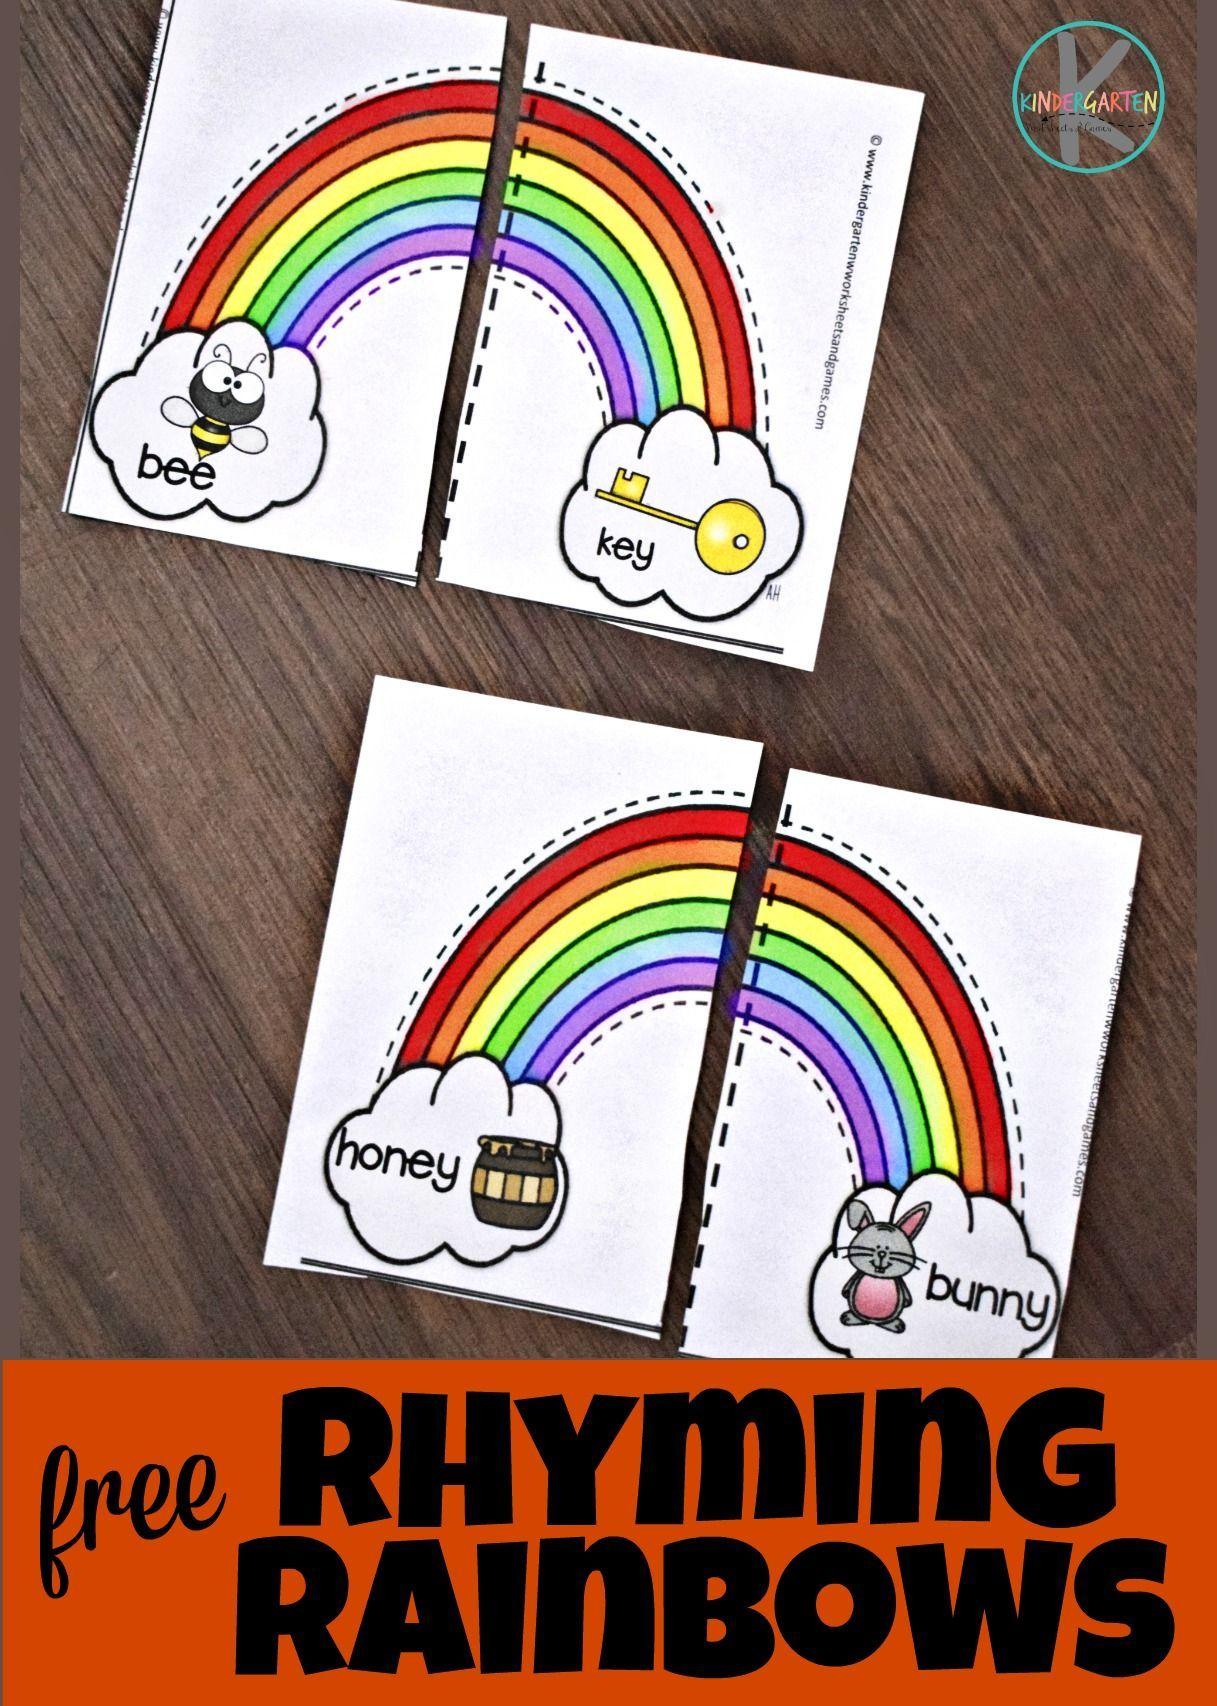 Free Rhyming Rainbows